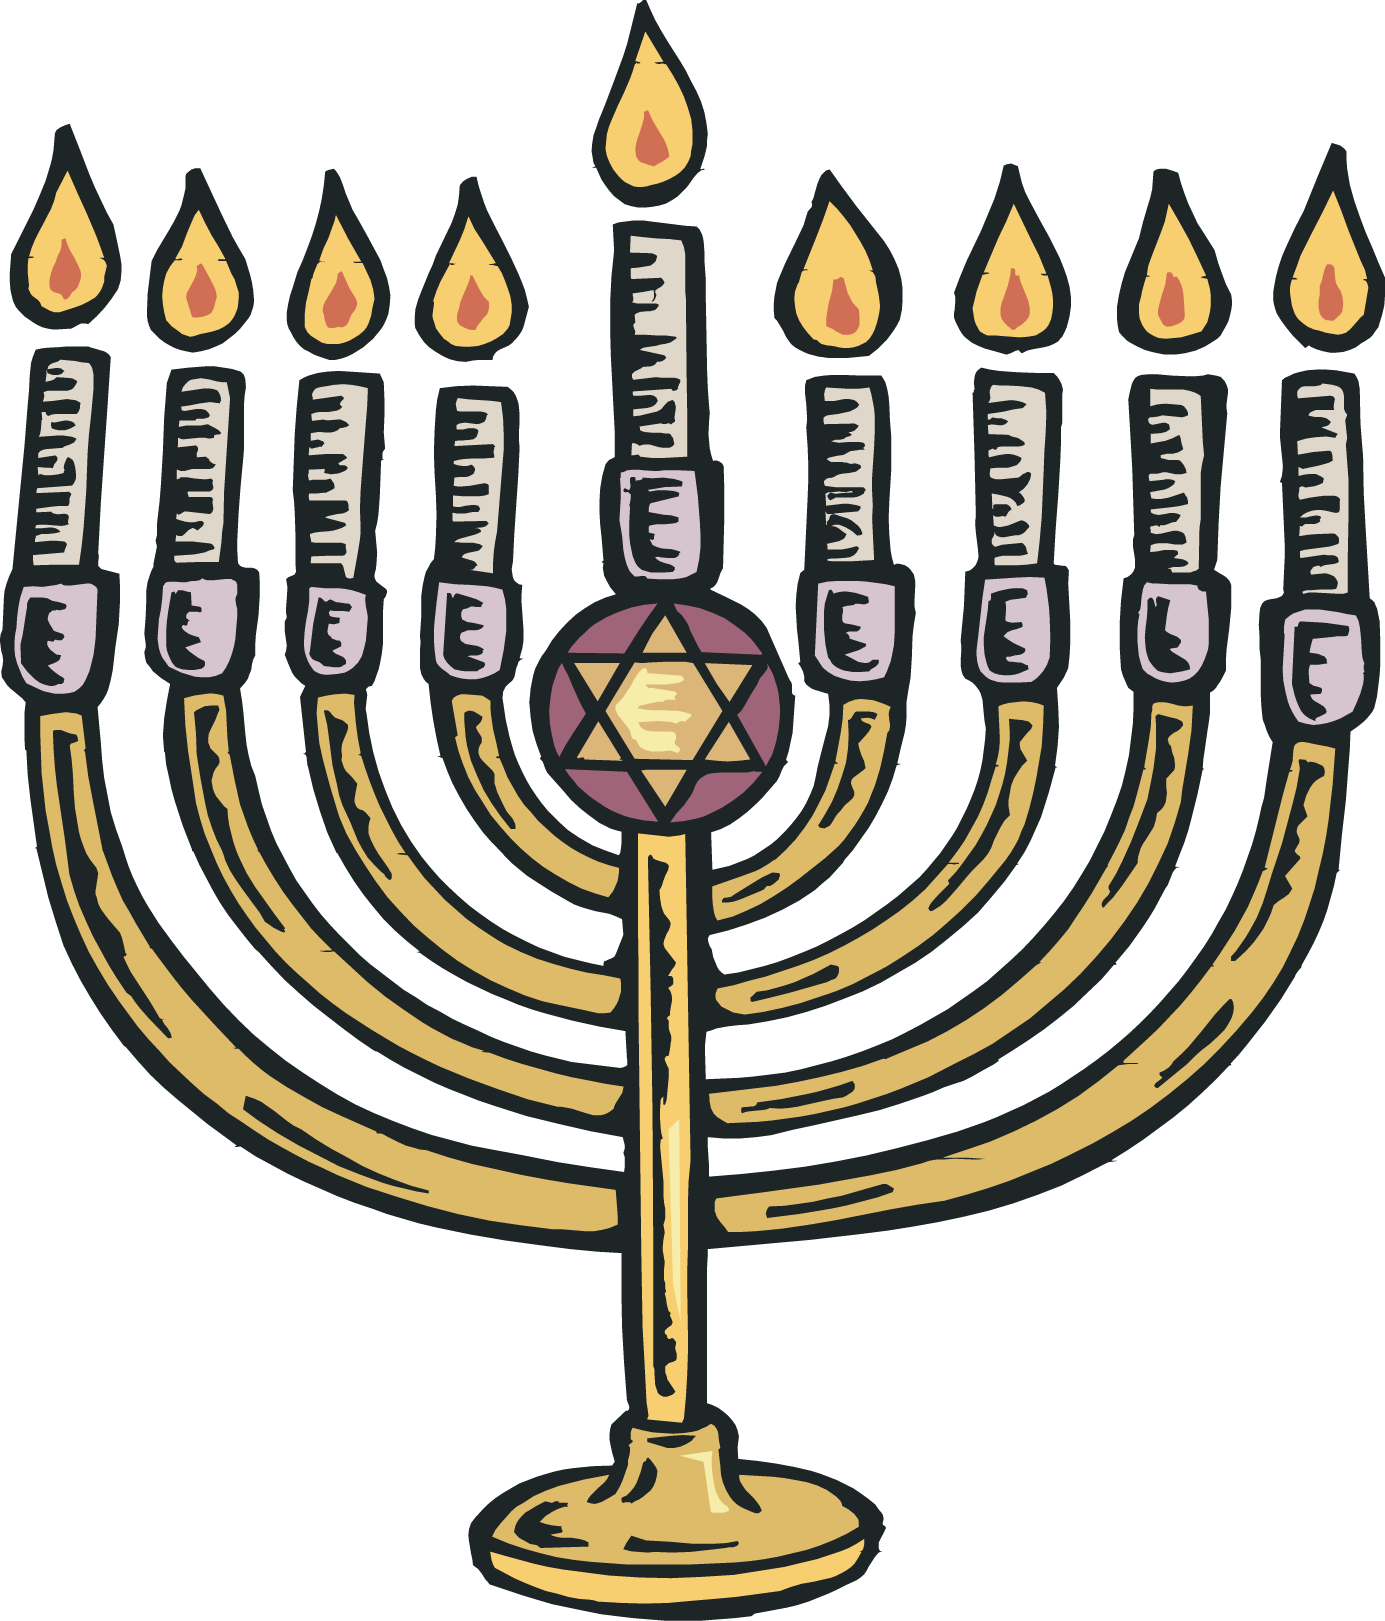 ... Hanukkah 20clipart - Free Clipart Im-... Hanukkah 20clipart - Free Clipart Images-16